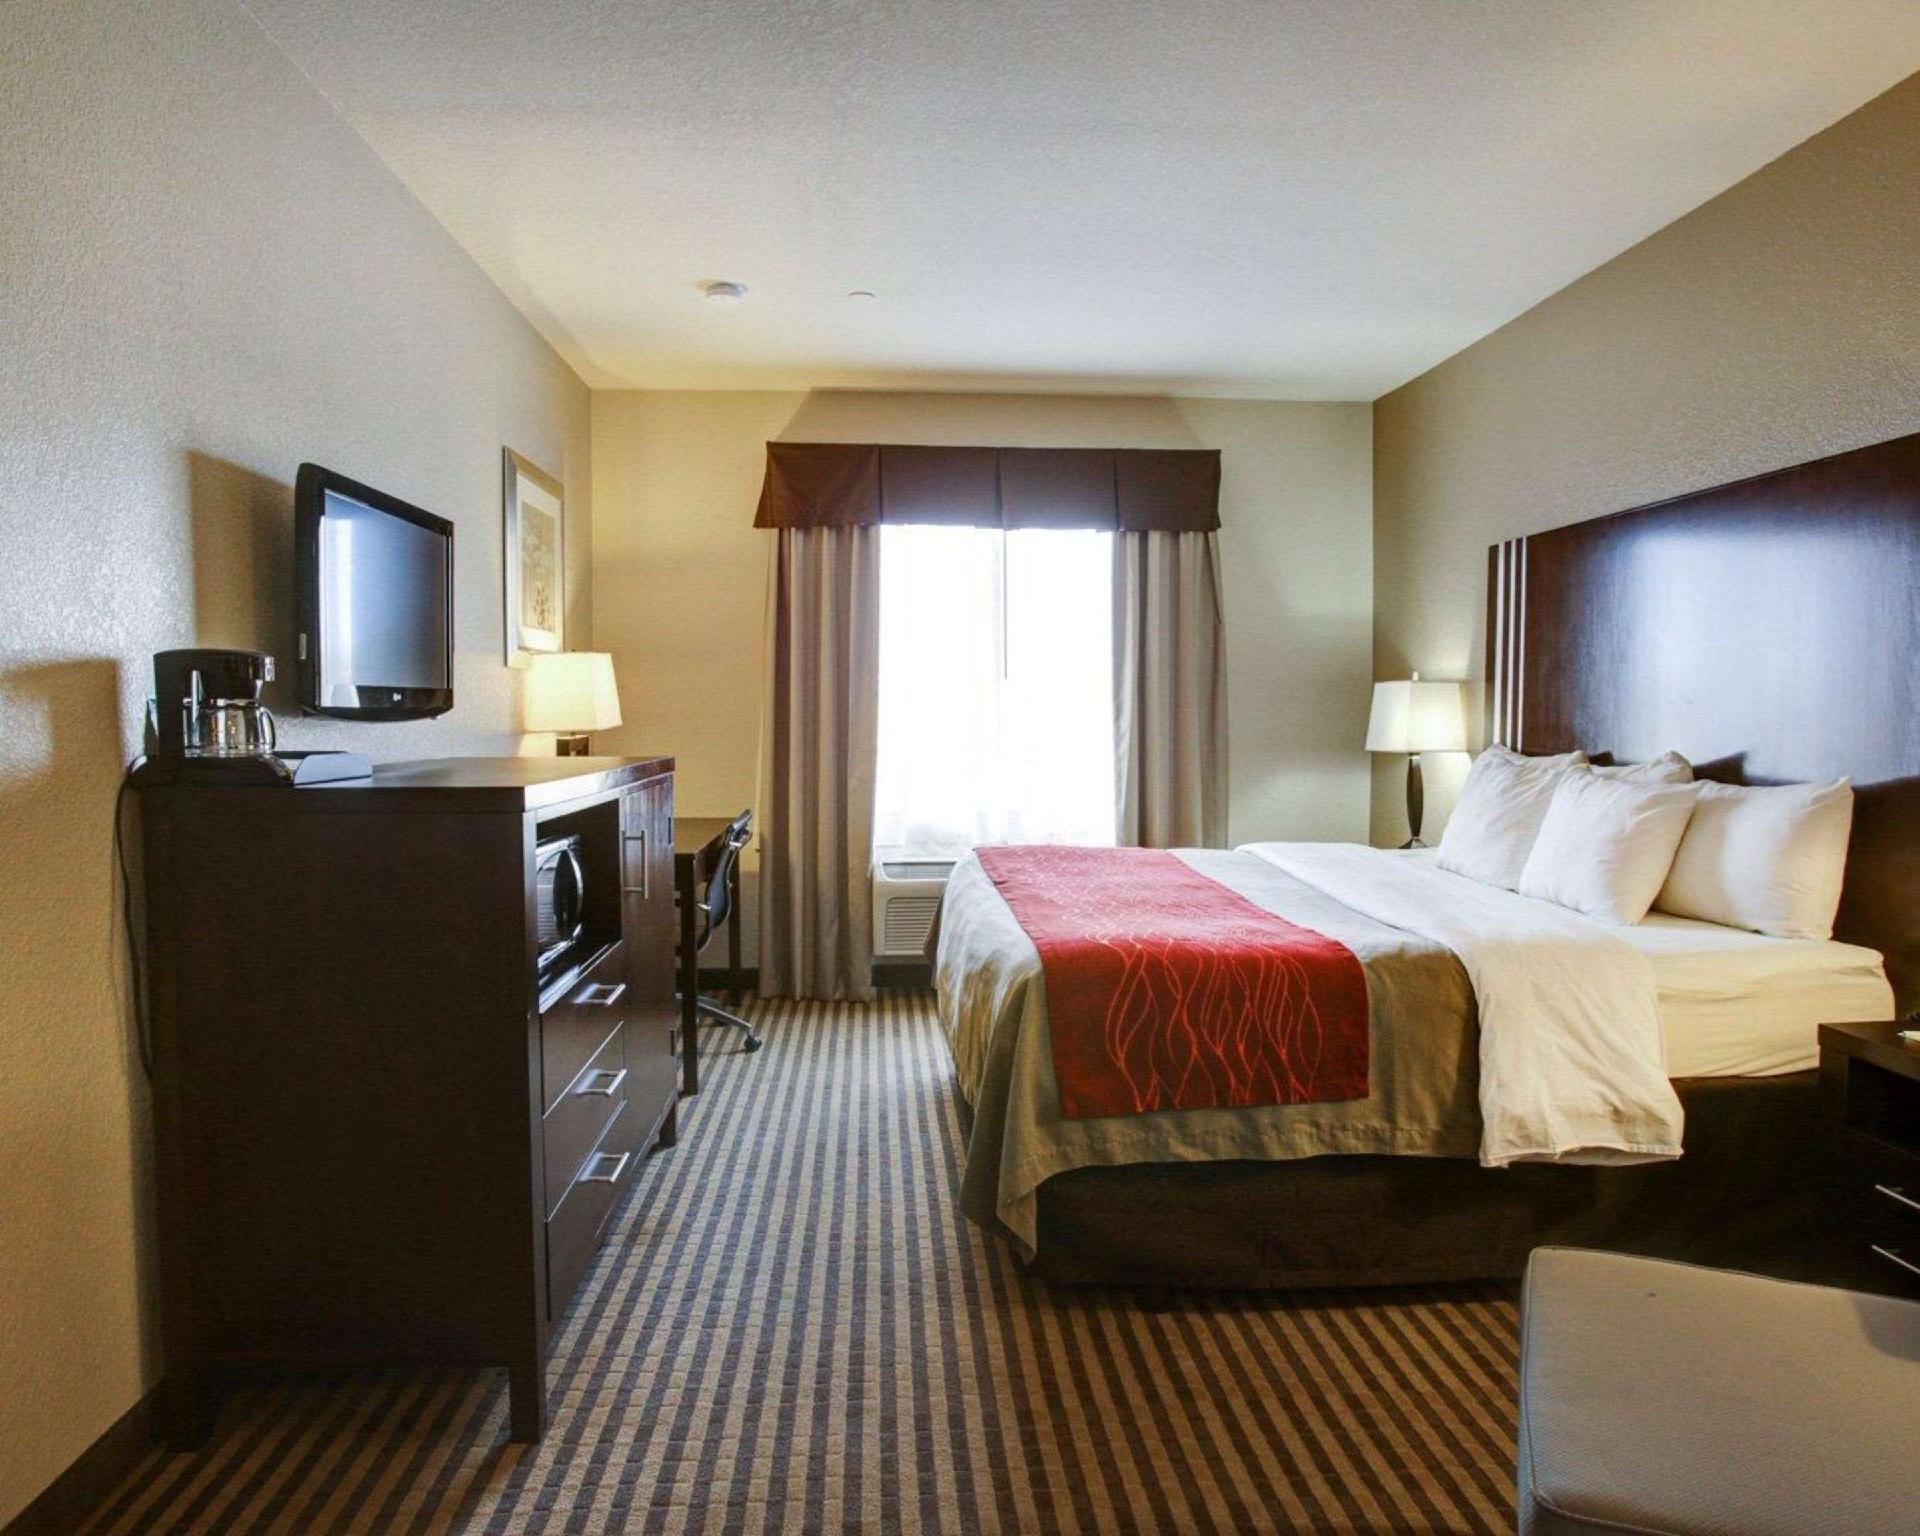 Comfort Inn & Suites Navasota, Grimes